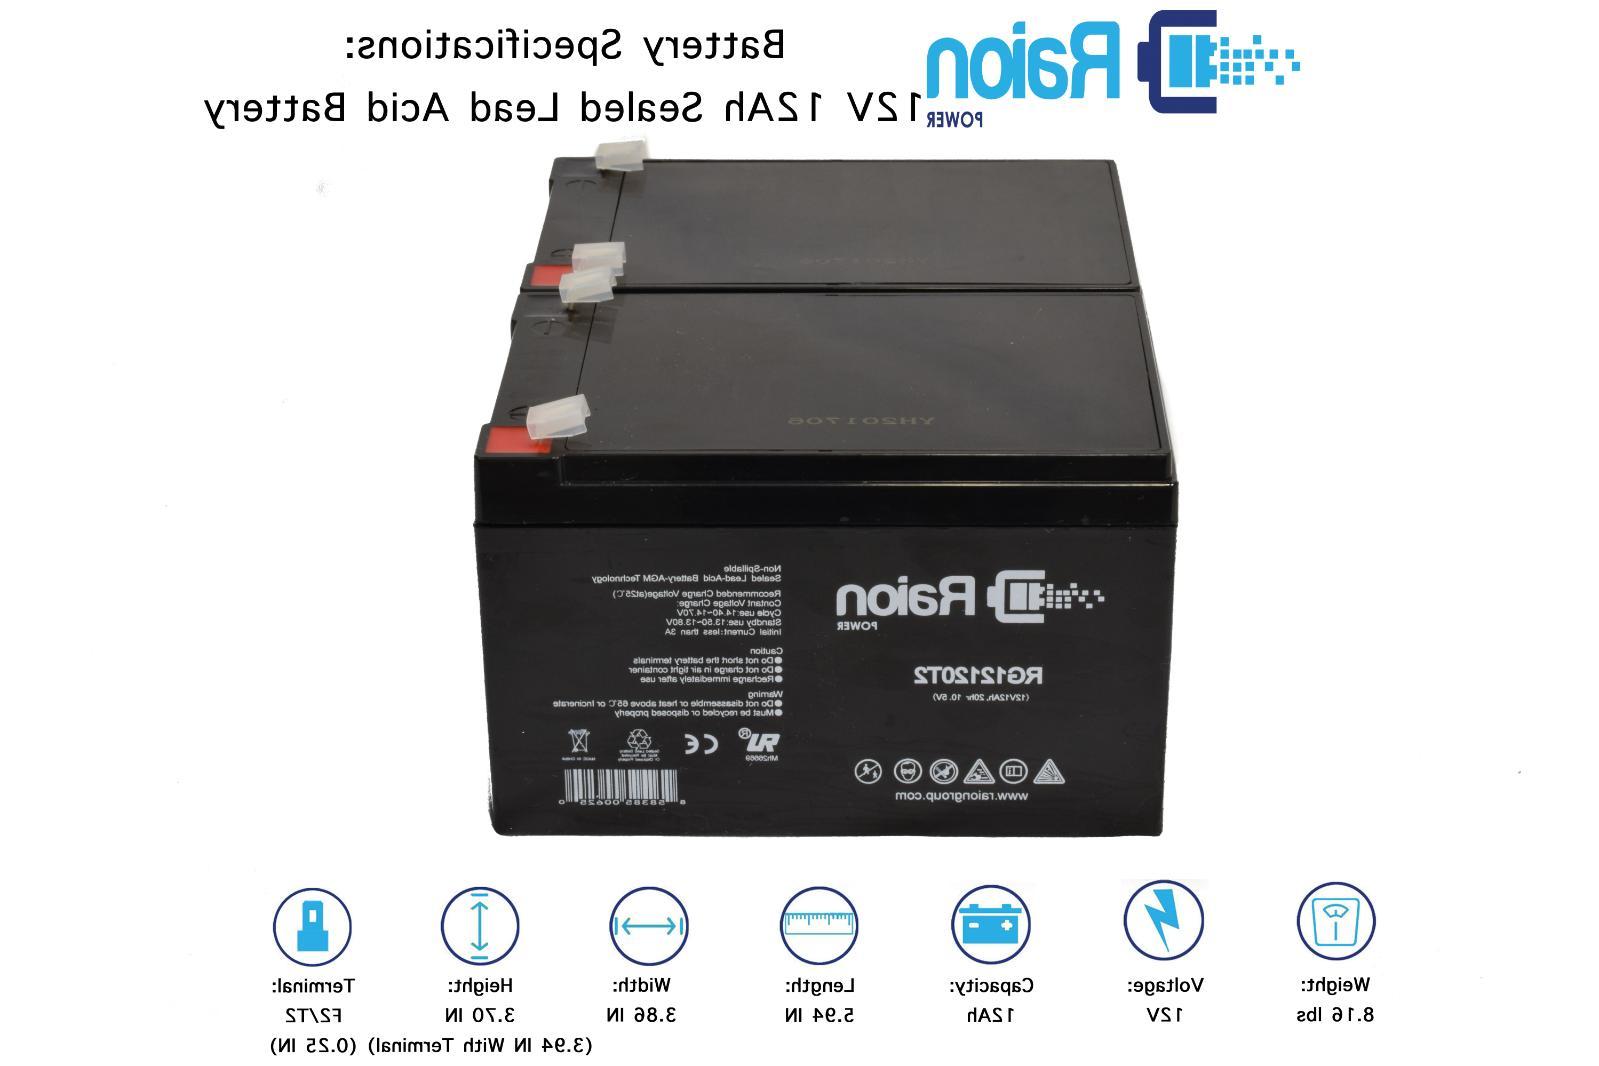 12ah battery